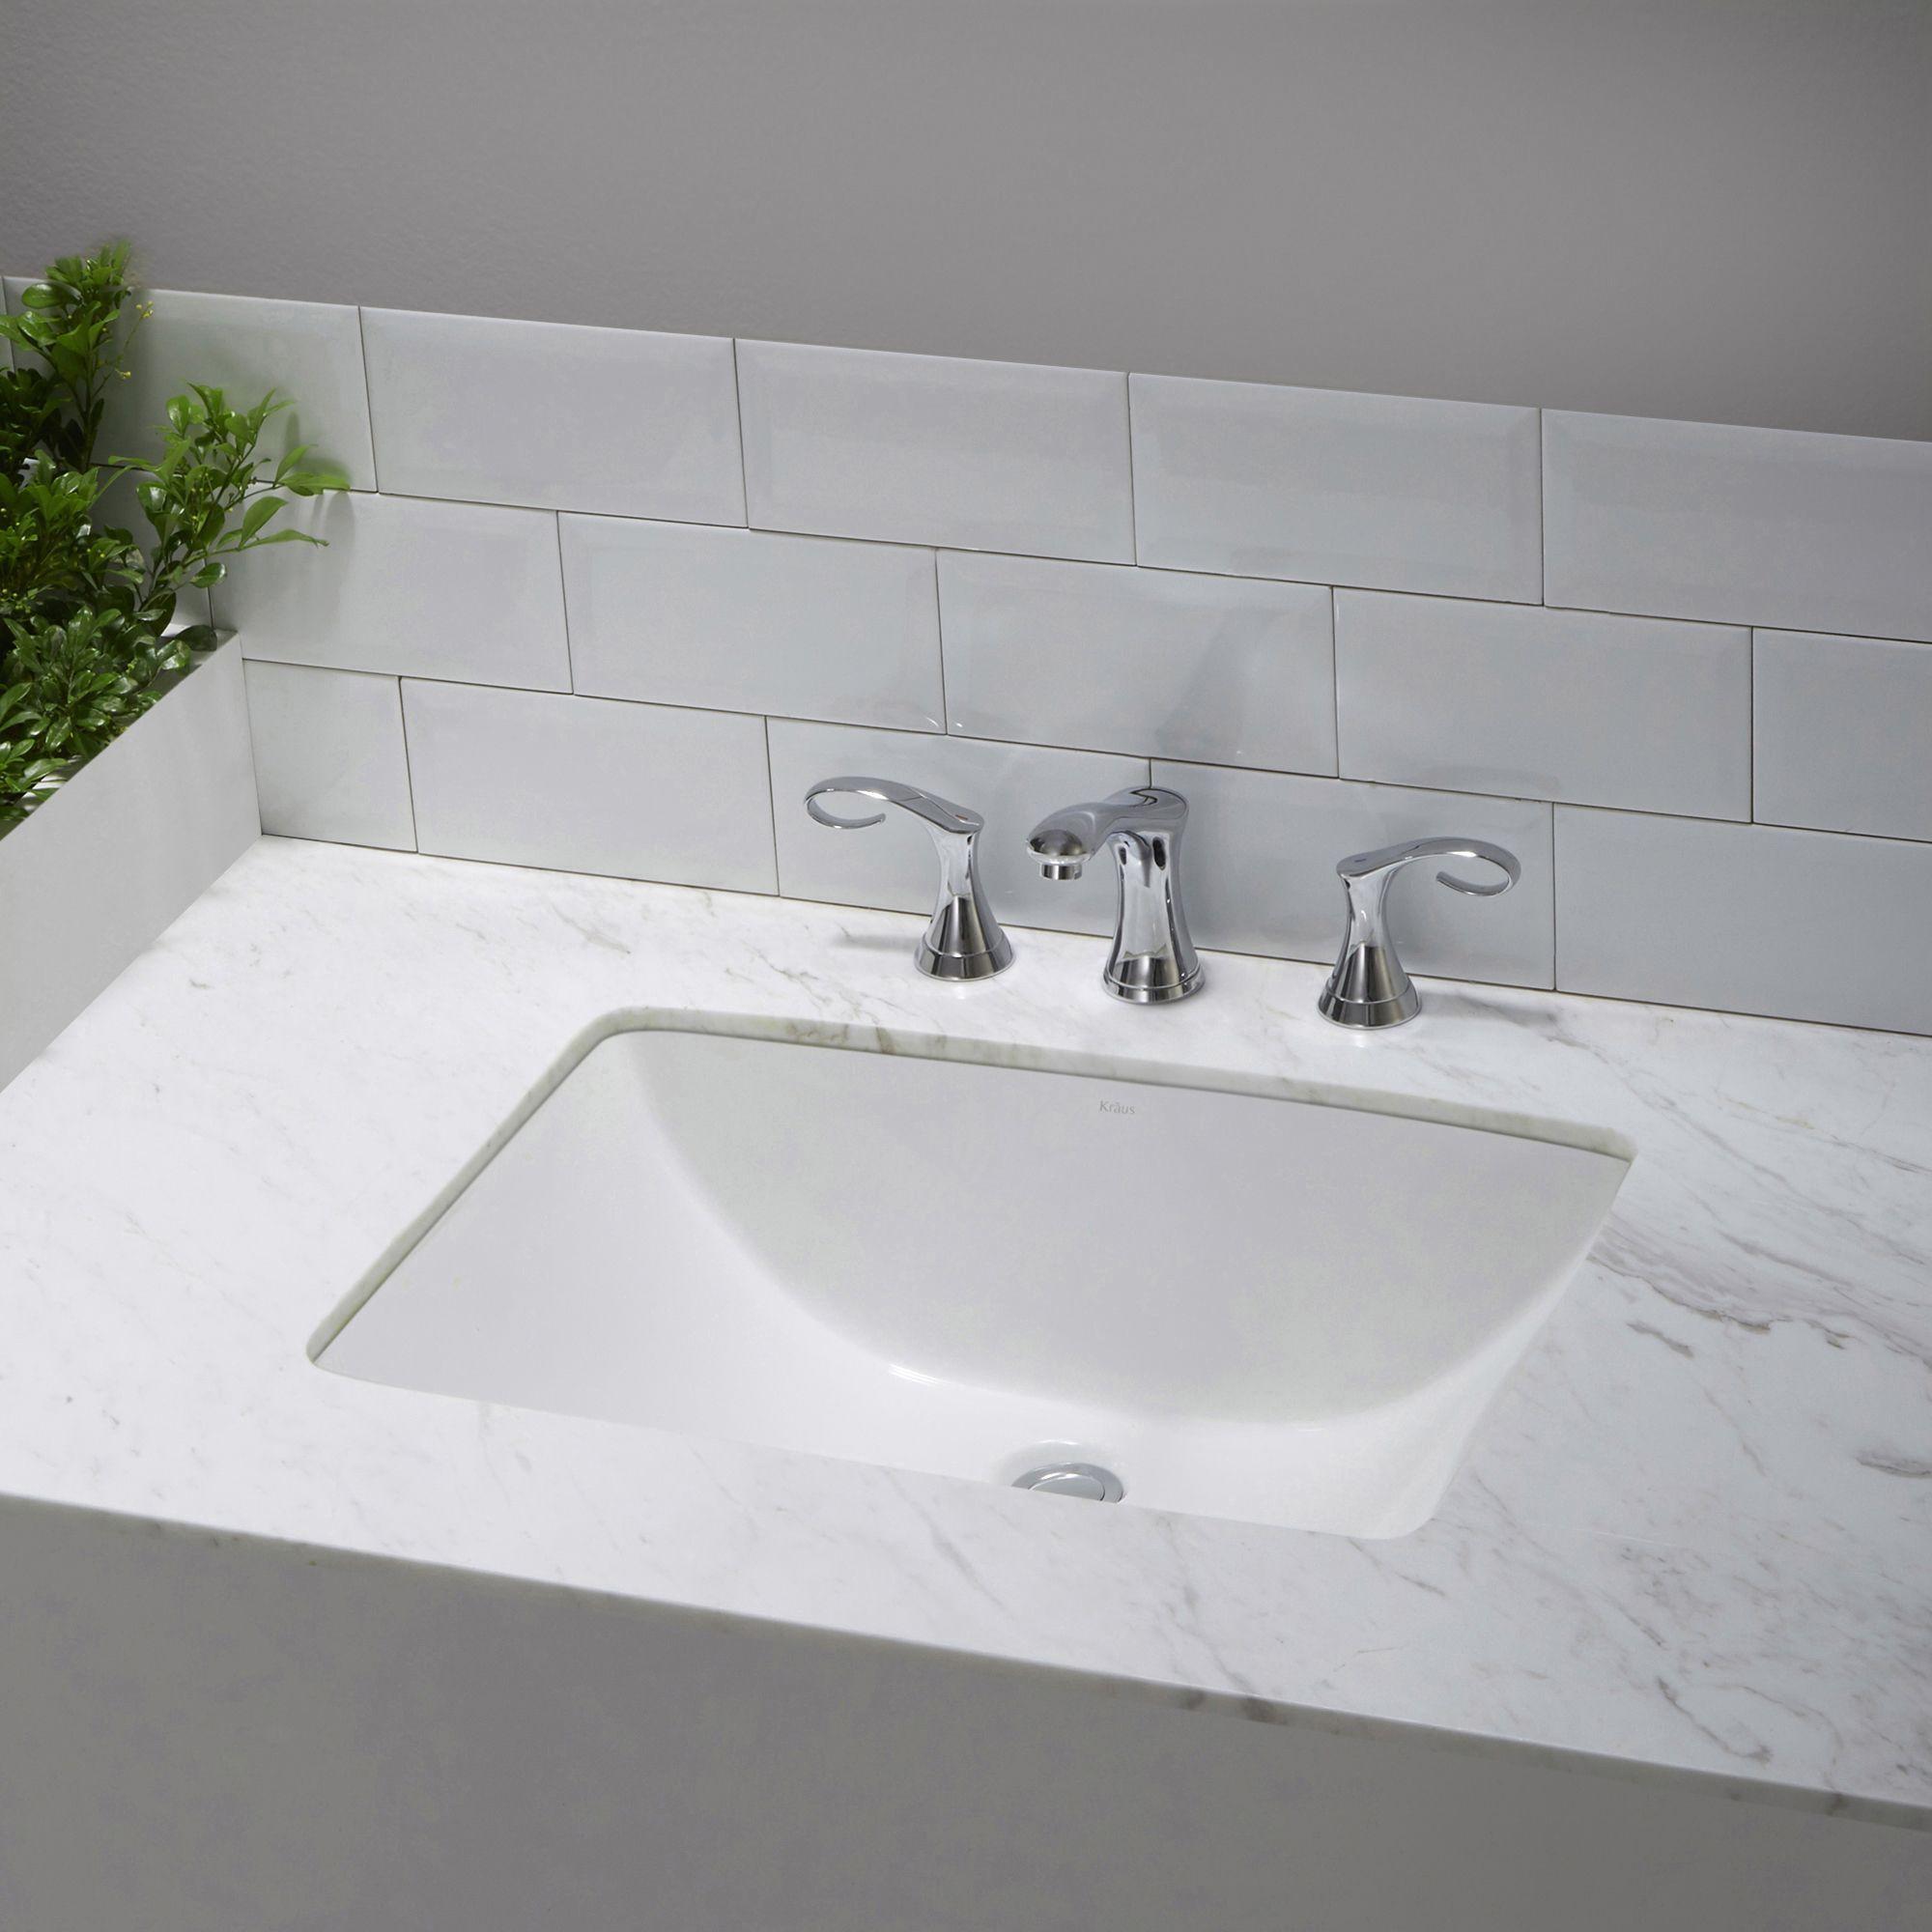 Kraus Kcu 251 Elavo 23 Inch Rectangle Undermount Porcelain Ceramic Vitreous Bathroom Sink In White Overflow Square Bathroom Sink Undermount Bathroom Sink Bathroom Sink